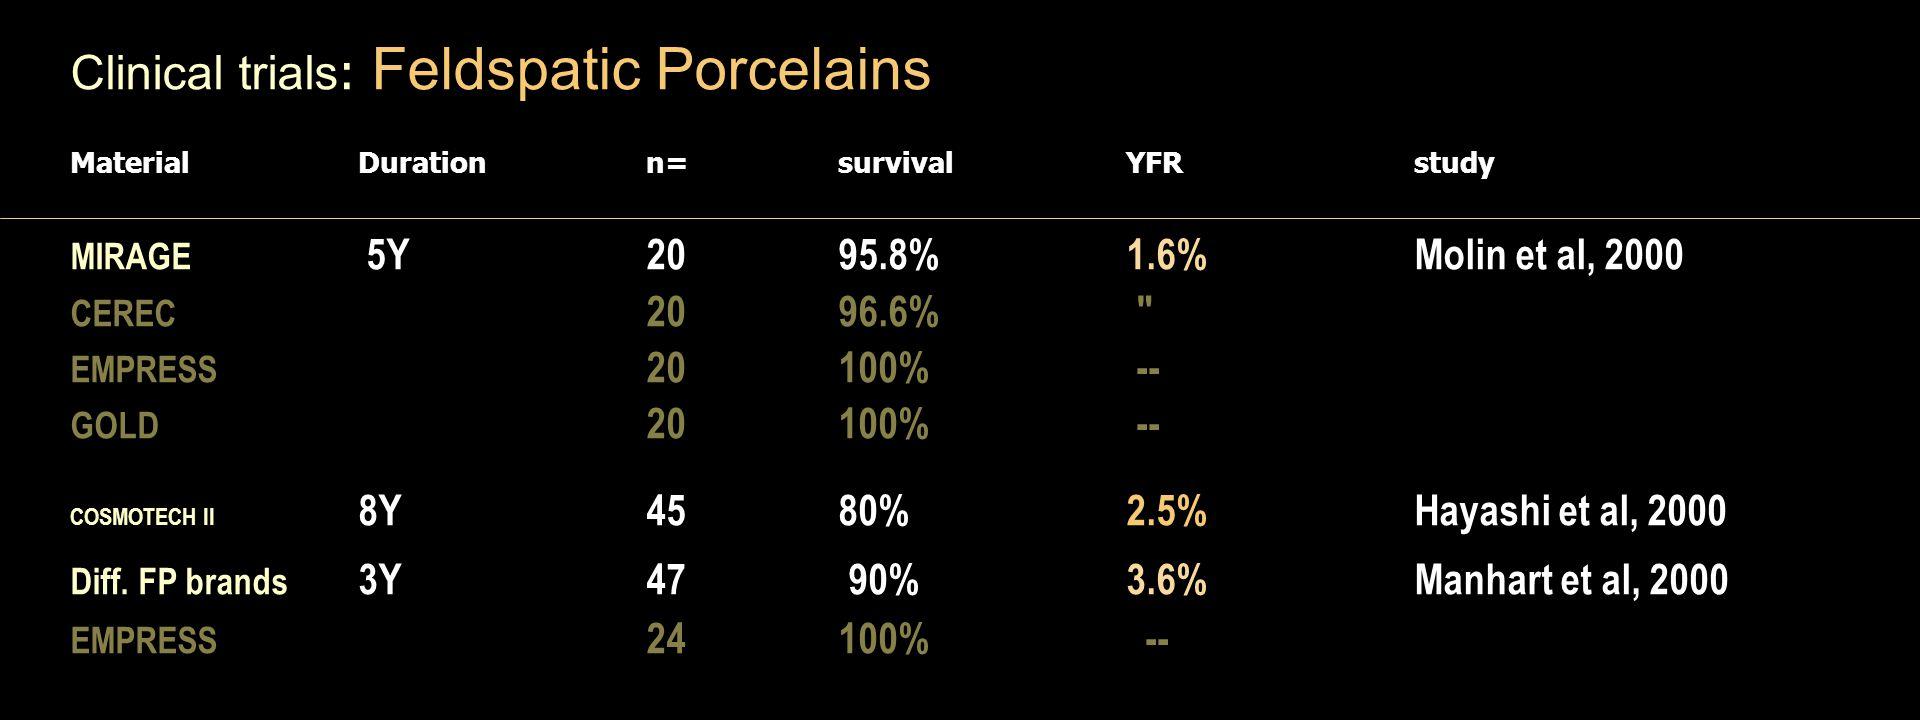 Clinical trials : Feldspatic Porcelains Material Duration n= survival YFR study MIRAGE 5Y 20 95.8% 1.6% Molin et al, 2000 CEREC 20 96.6% EMPRESS 20 100% -- GOLD 20 100% -- COSMOTECH II 8Y 45 80% 2.5% Hayashi et al, 2000 Diff.